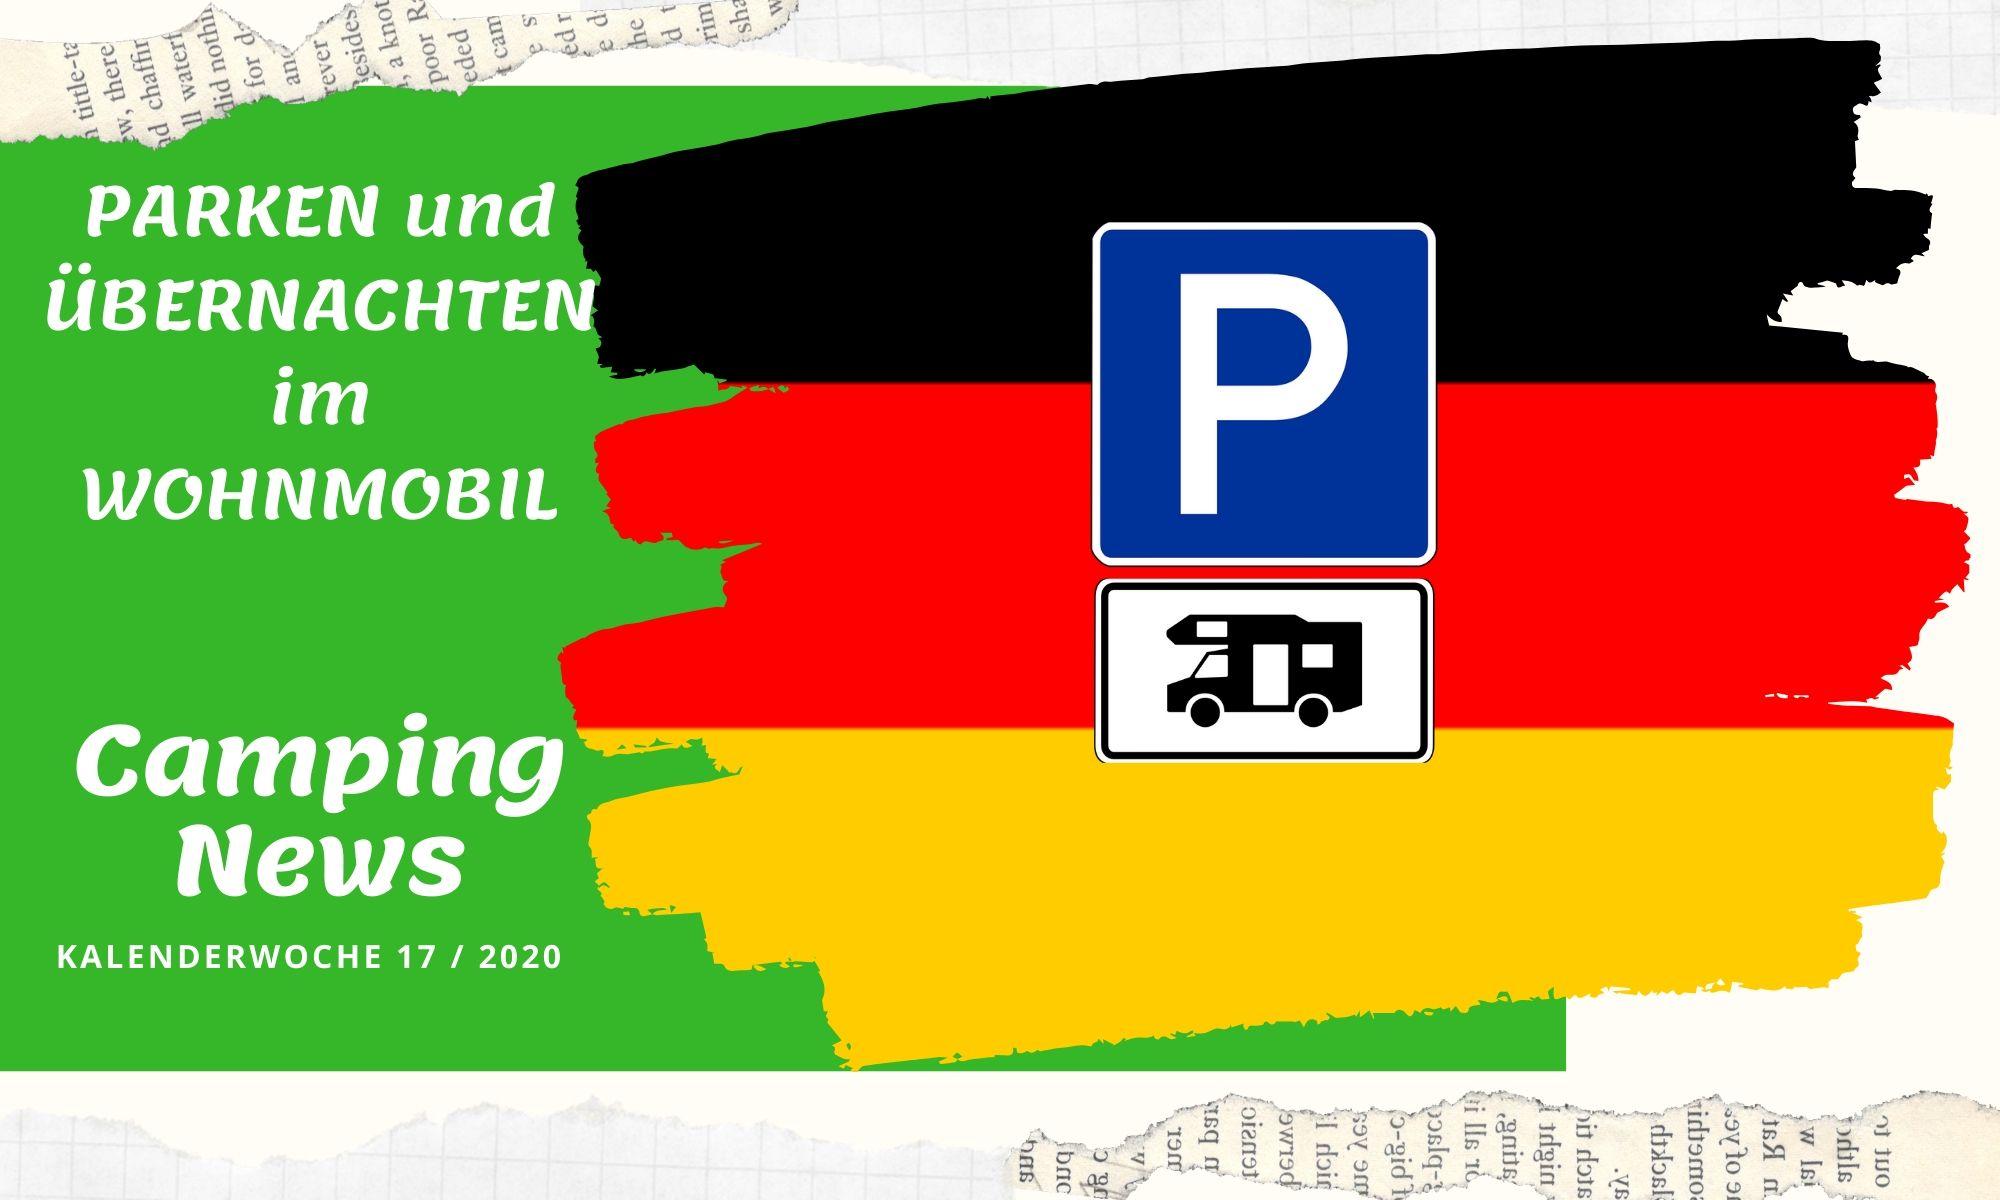 Wochenrückblick Camping News KW17-2020